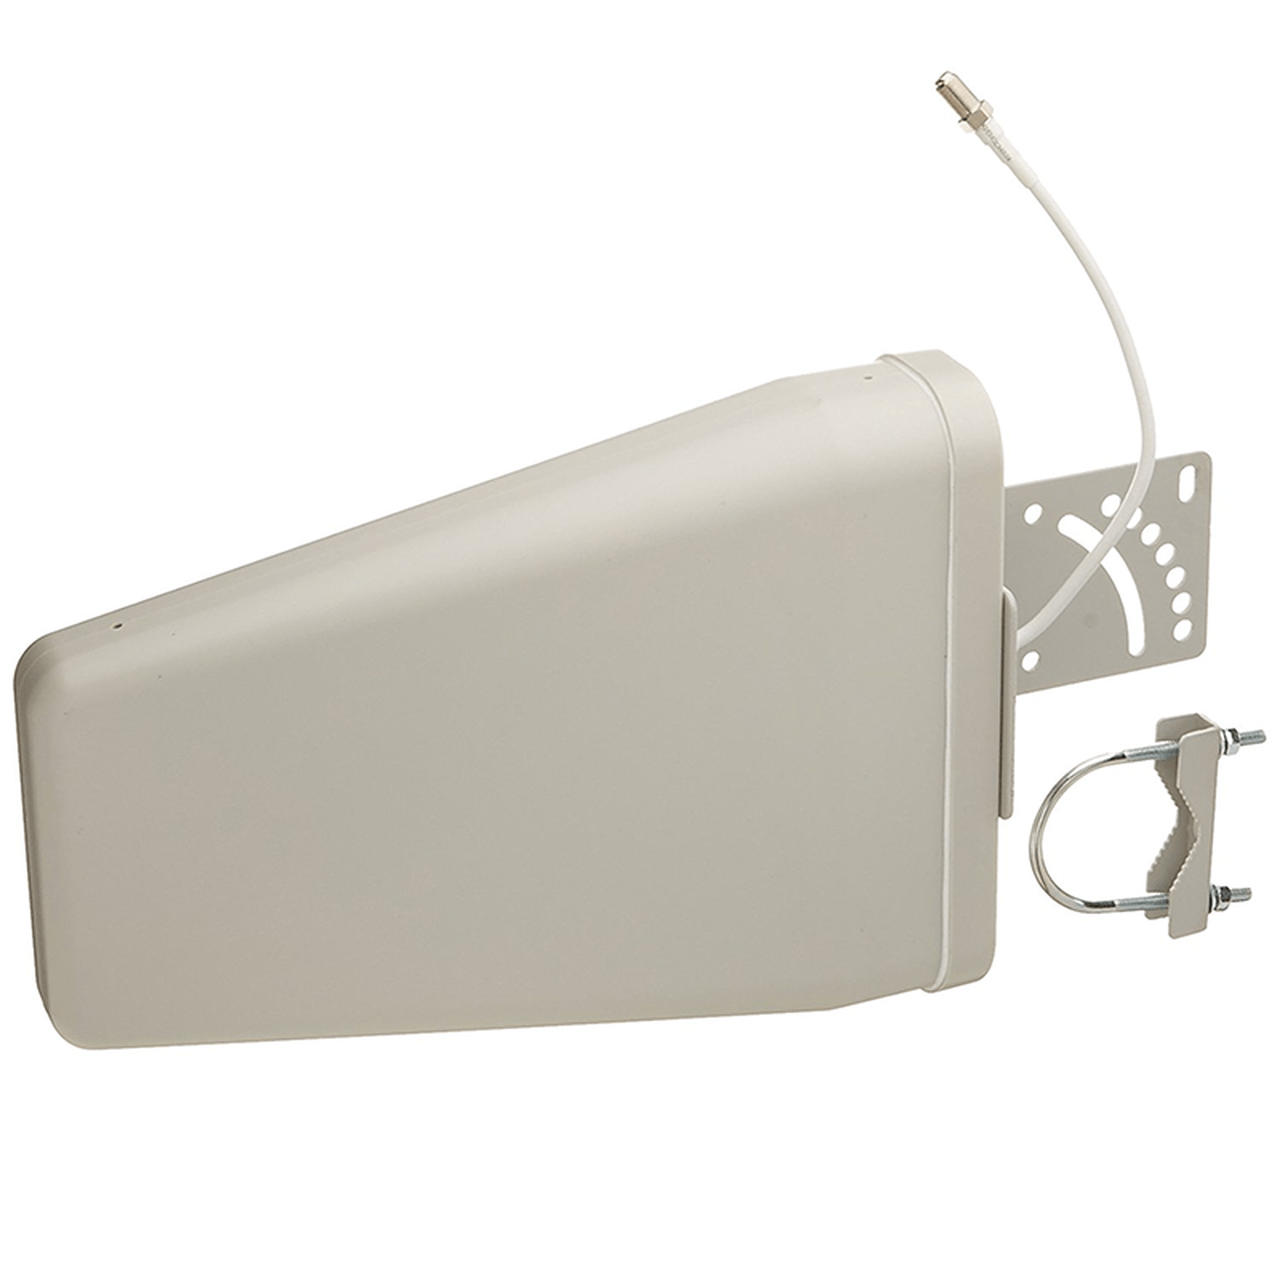 wilson yagi antenna 314475 | weBoost cell phone signal booster